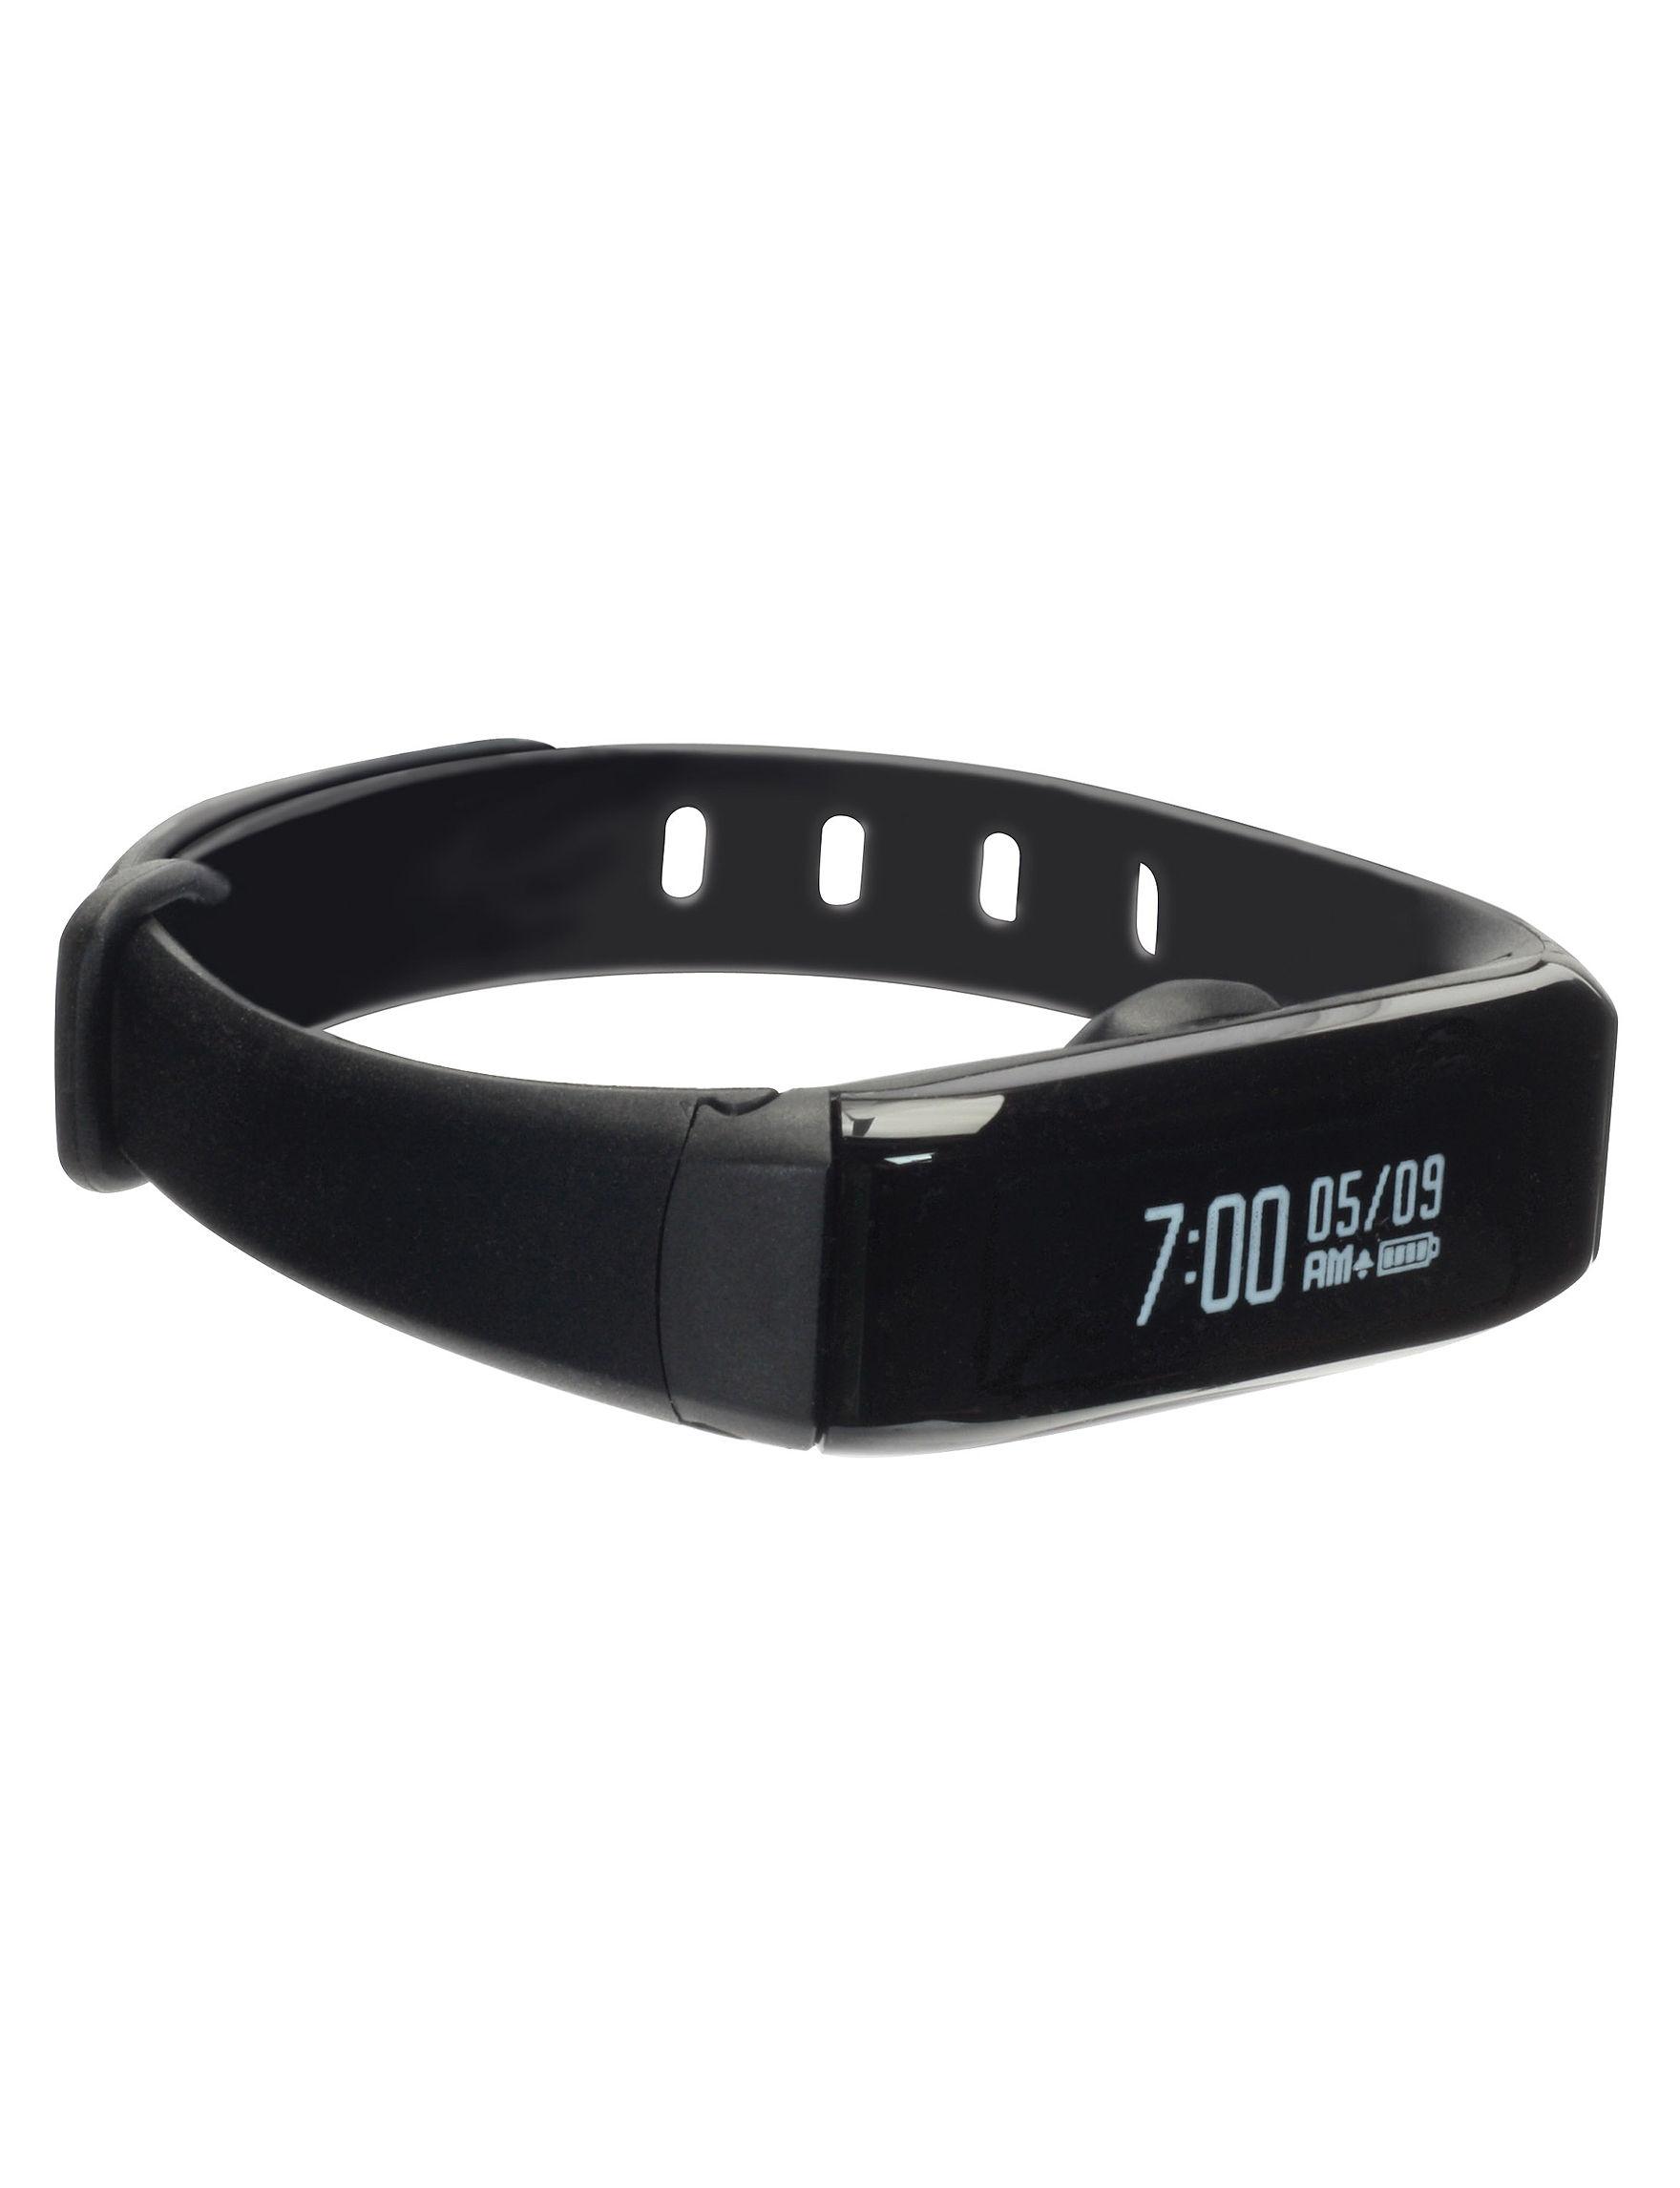 WeGo  Sport Watches Fitness Tech & Tracking